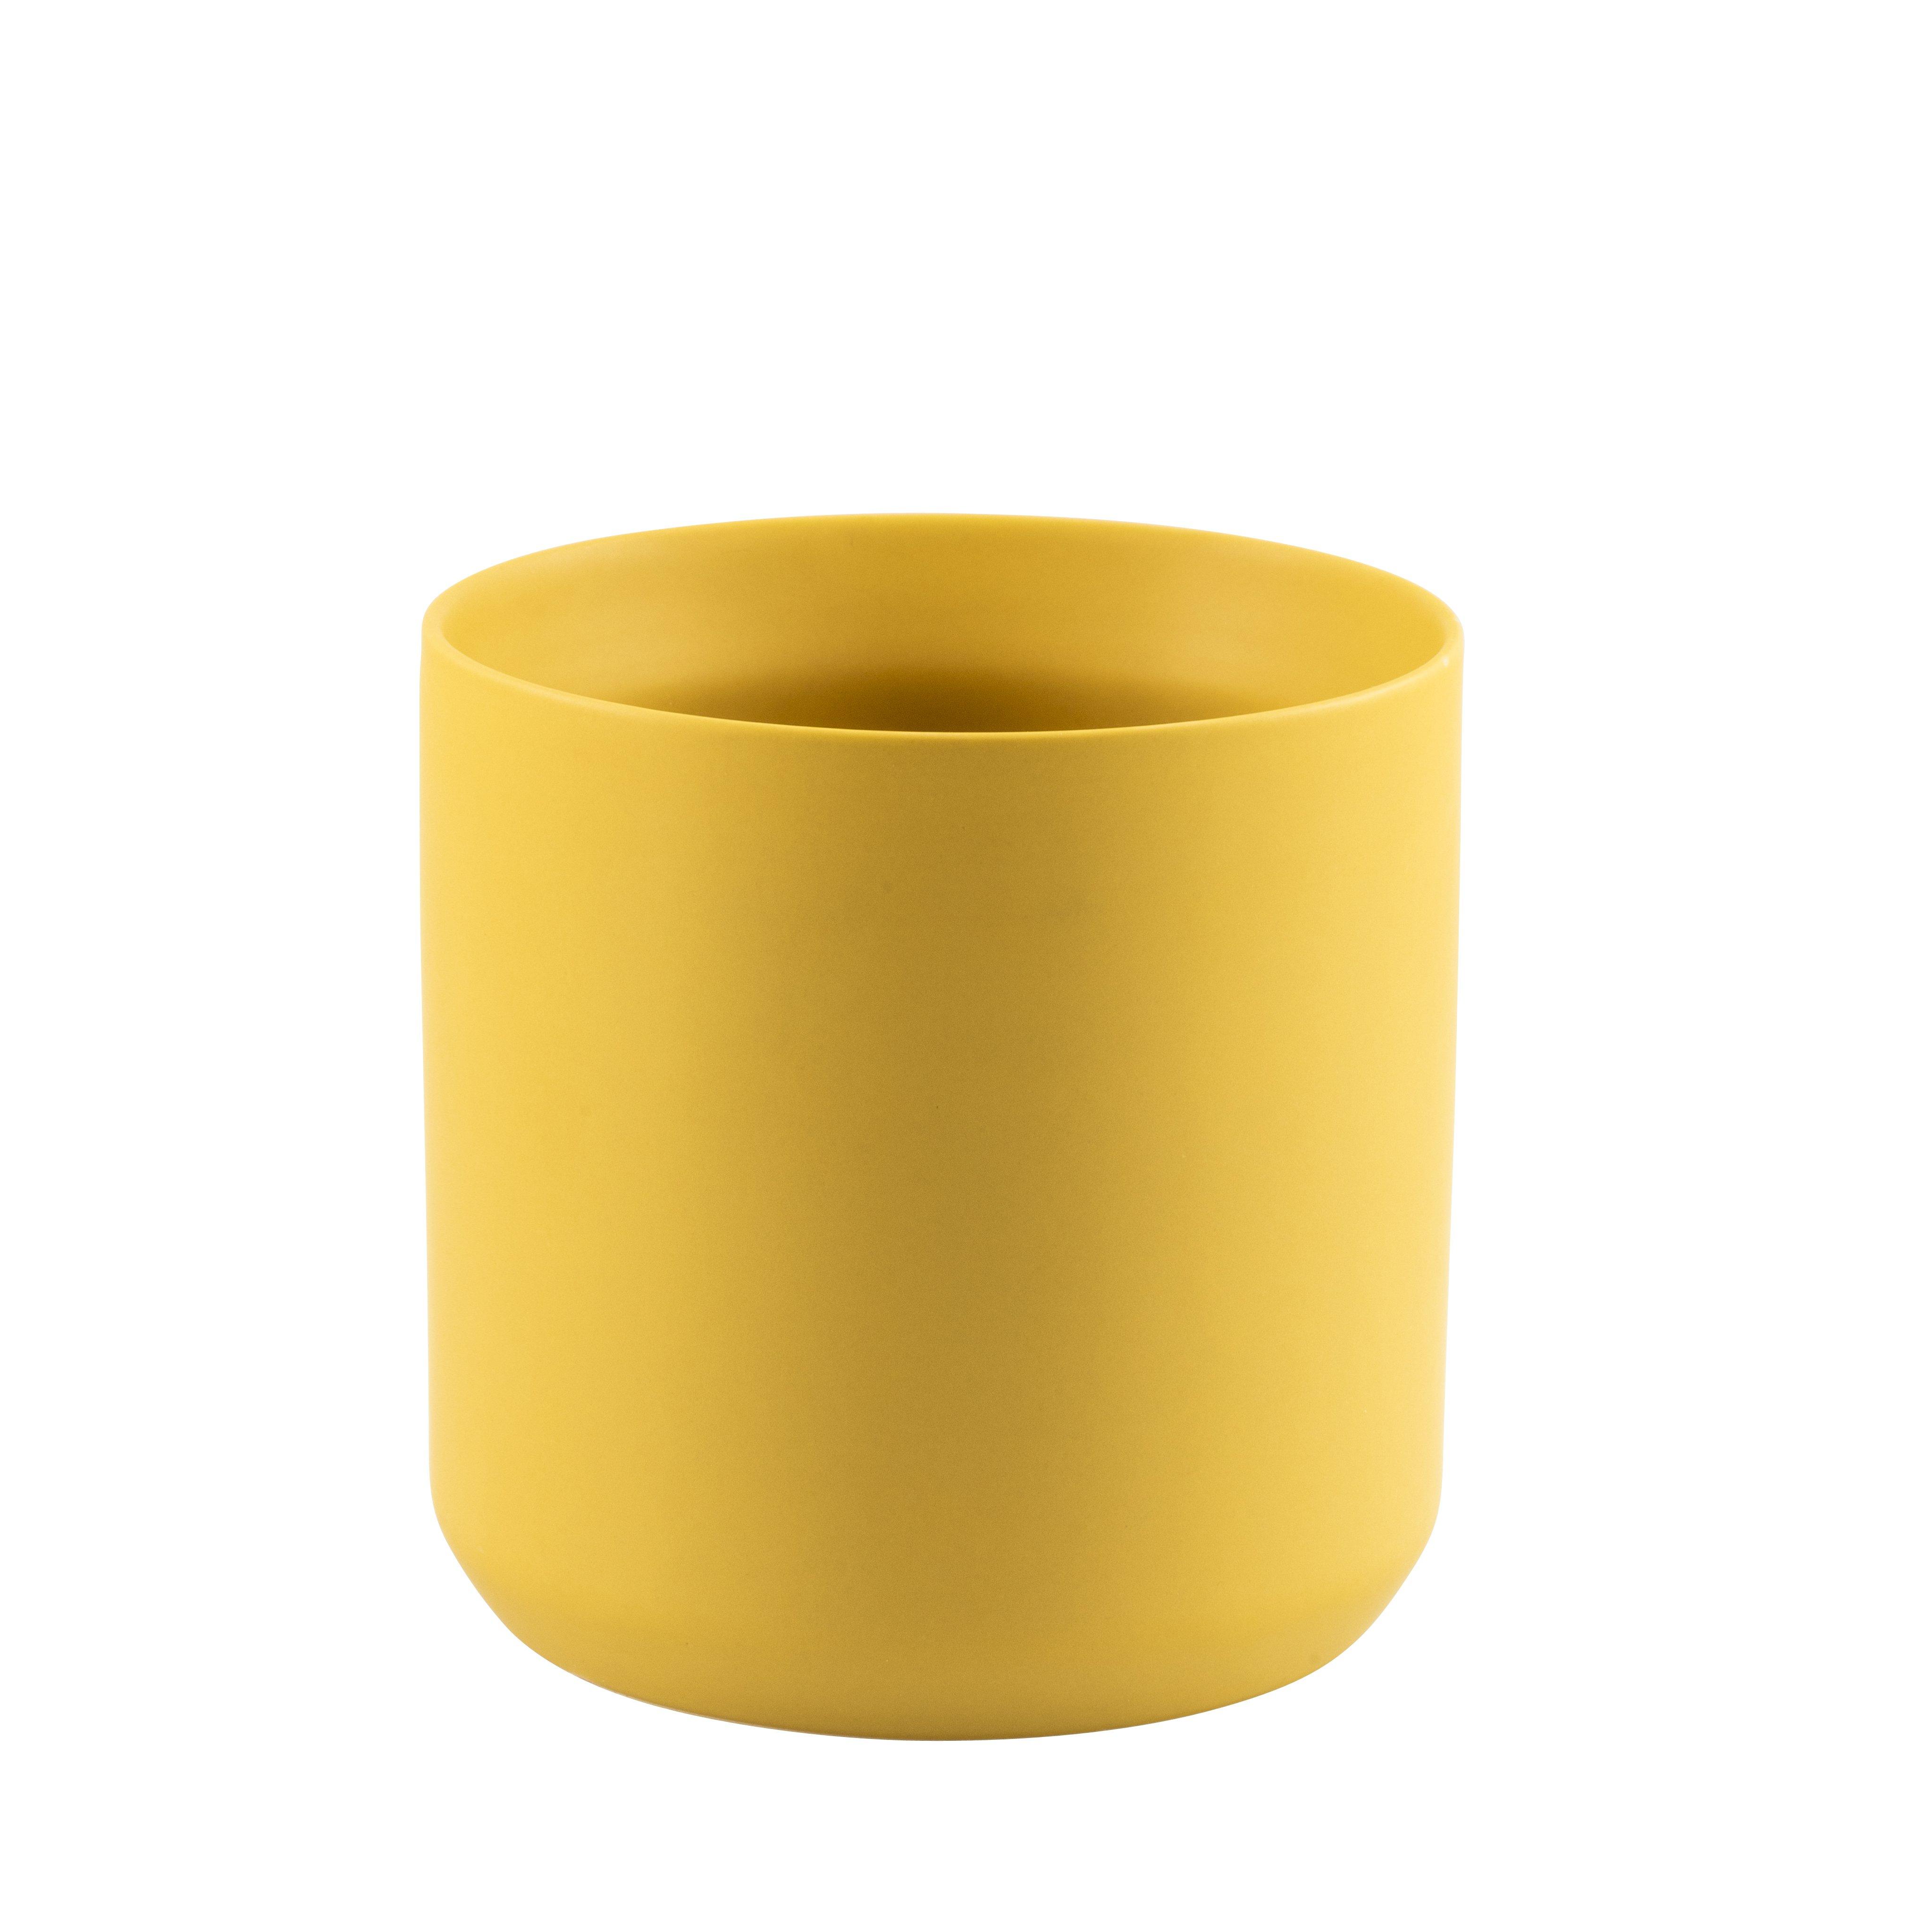 Potte Avat gul 13 cm